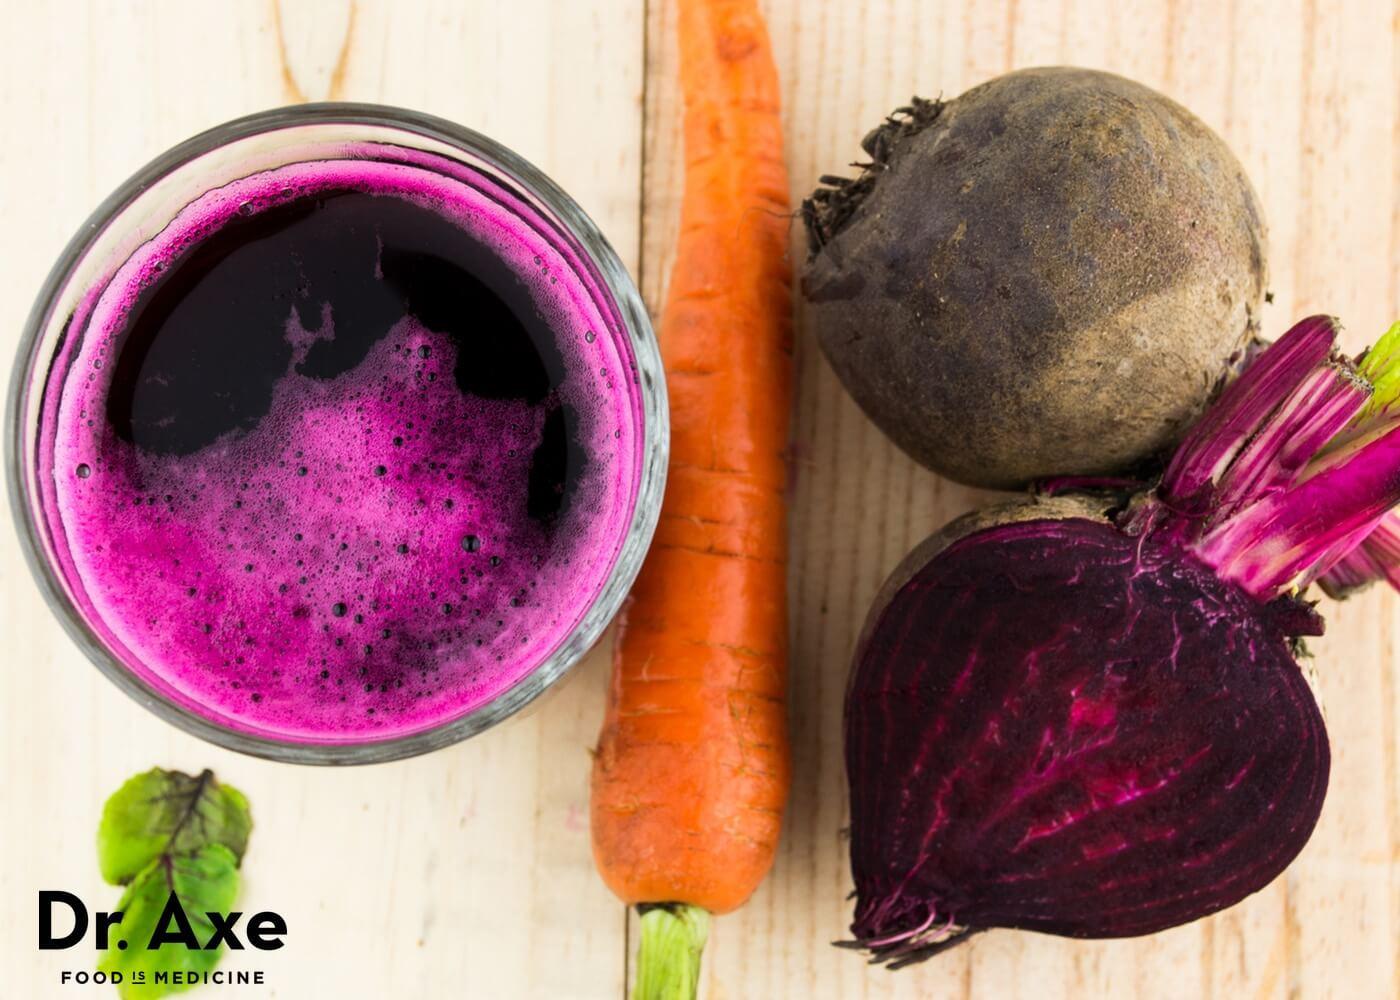 Heart Healthy Juice Recipes  Heart Healthy Juice Recipe Dr Axe